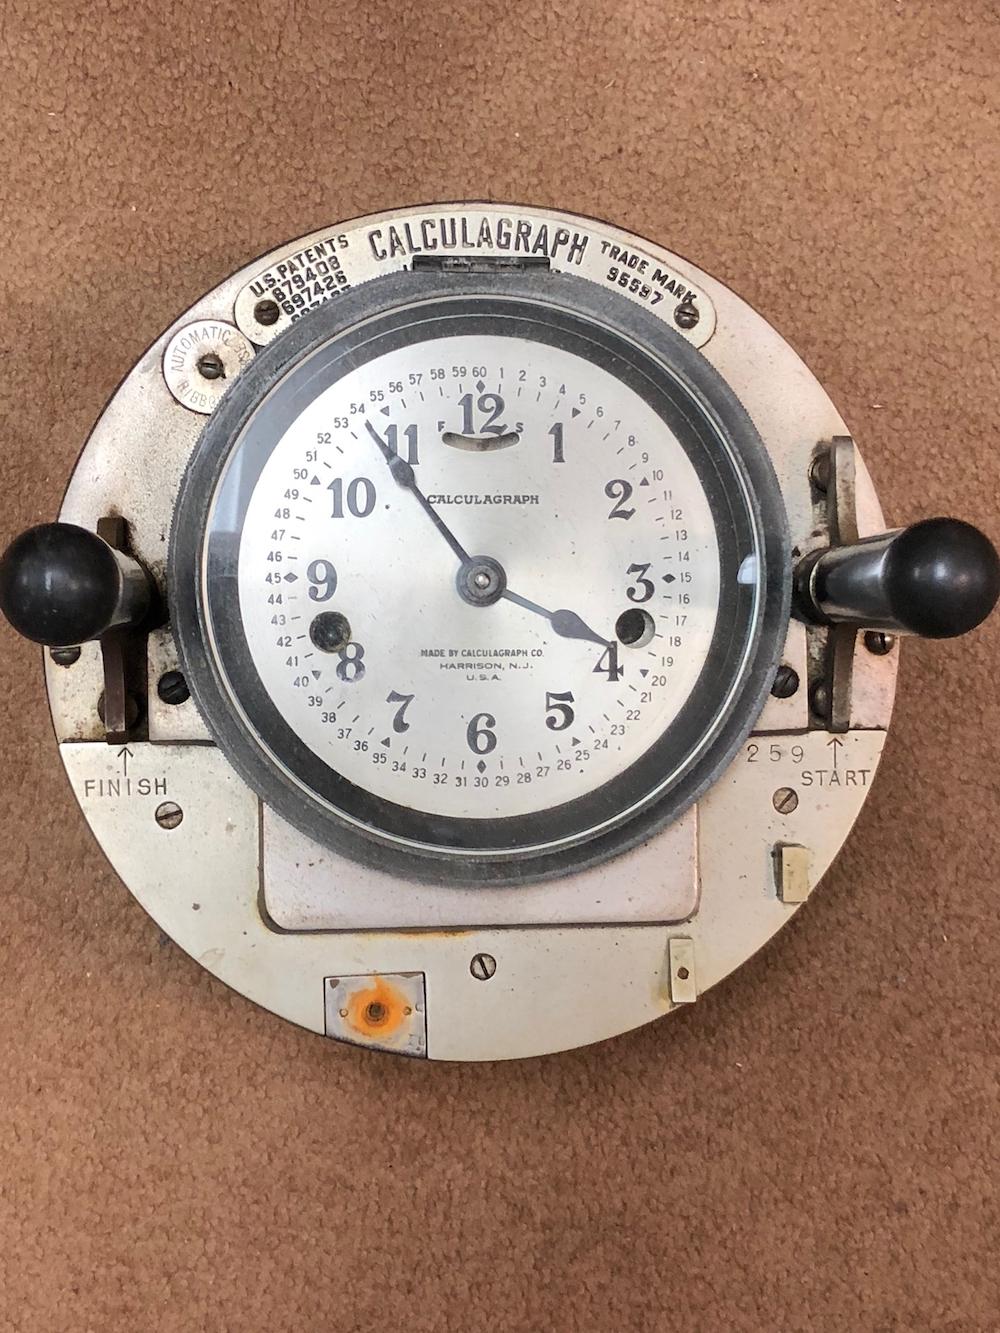 Vintage Calculagraph